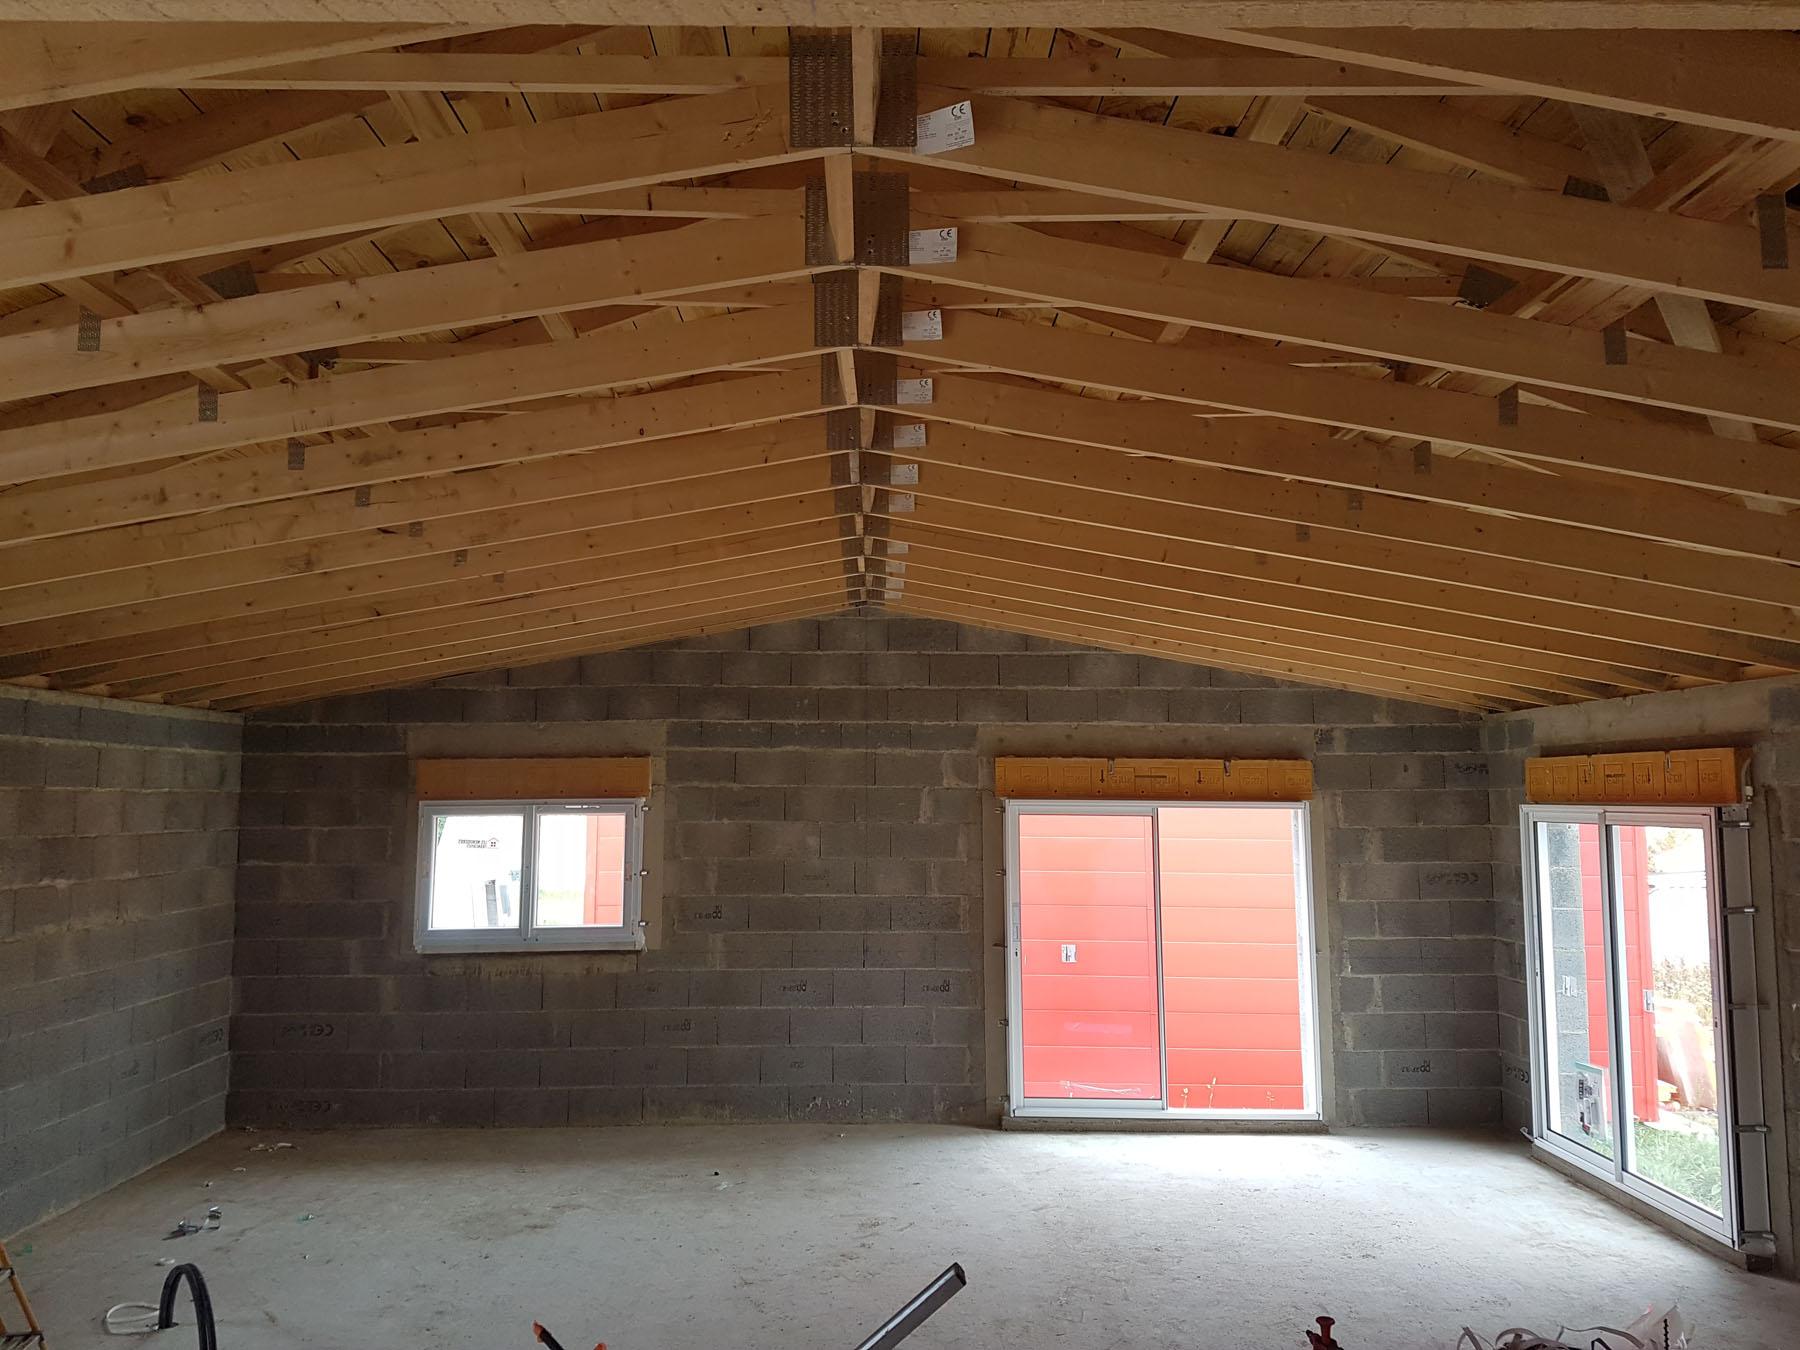 charpente industrielle fermette mba menuiserie. Black Bedroom Furniture Sets. Home Design Ideas